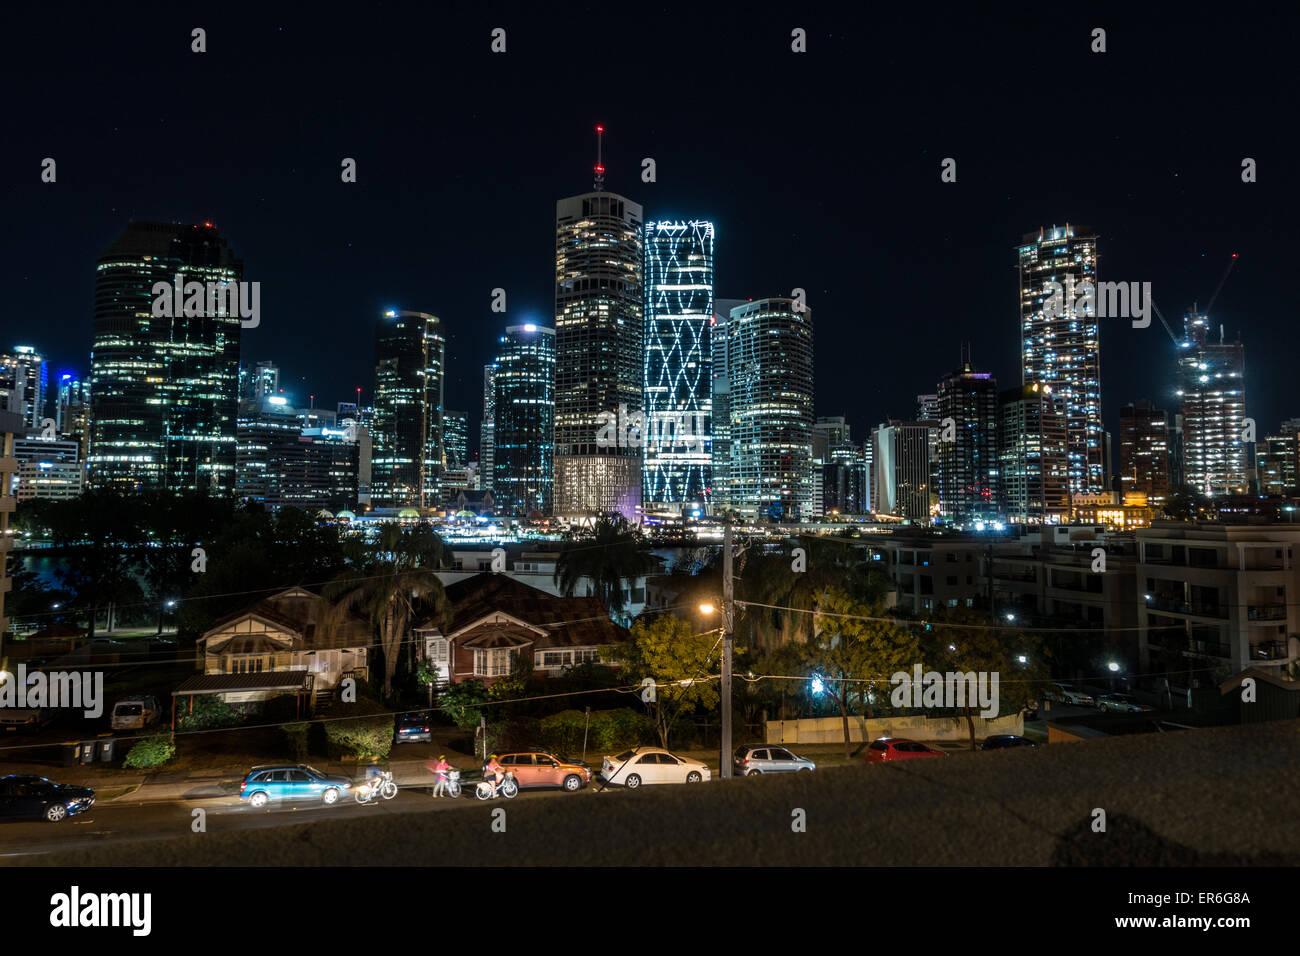 Brisbane City Skyline behind houses - Stock Image